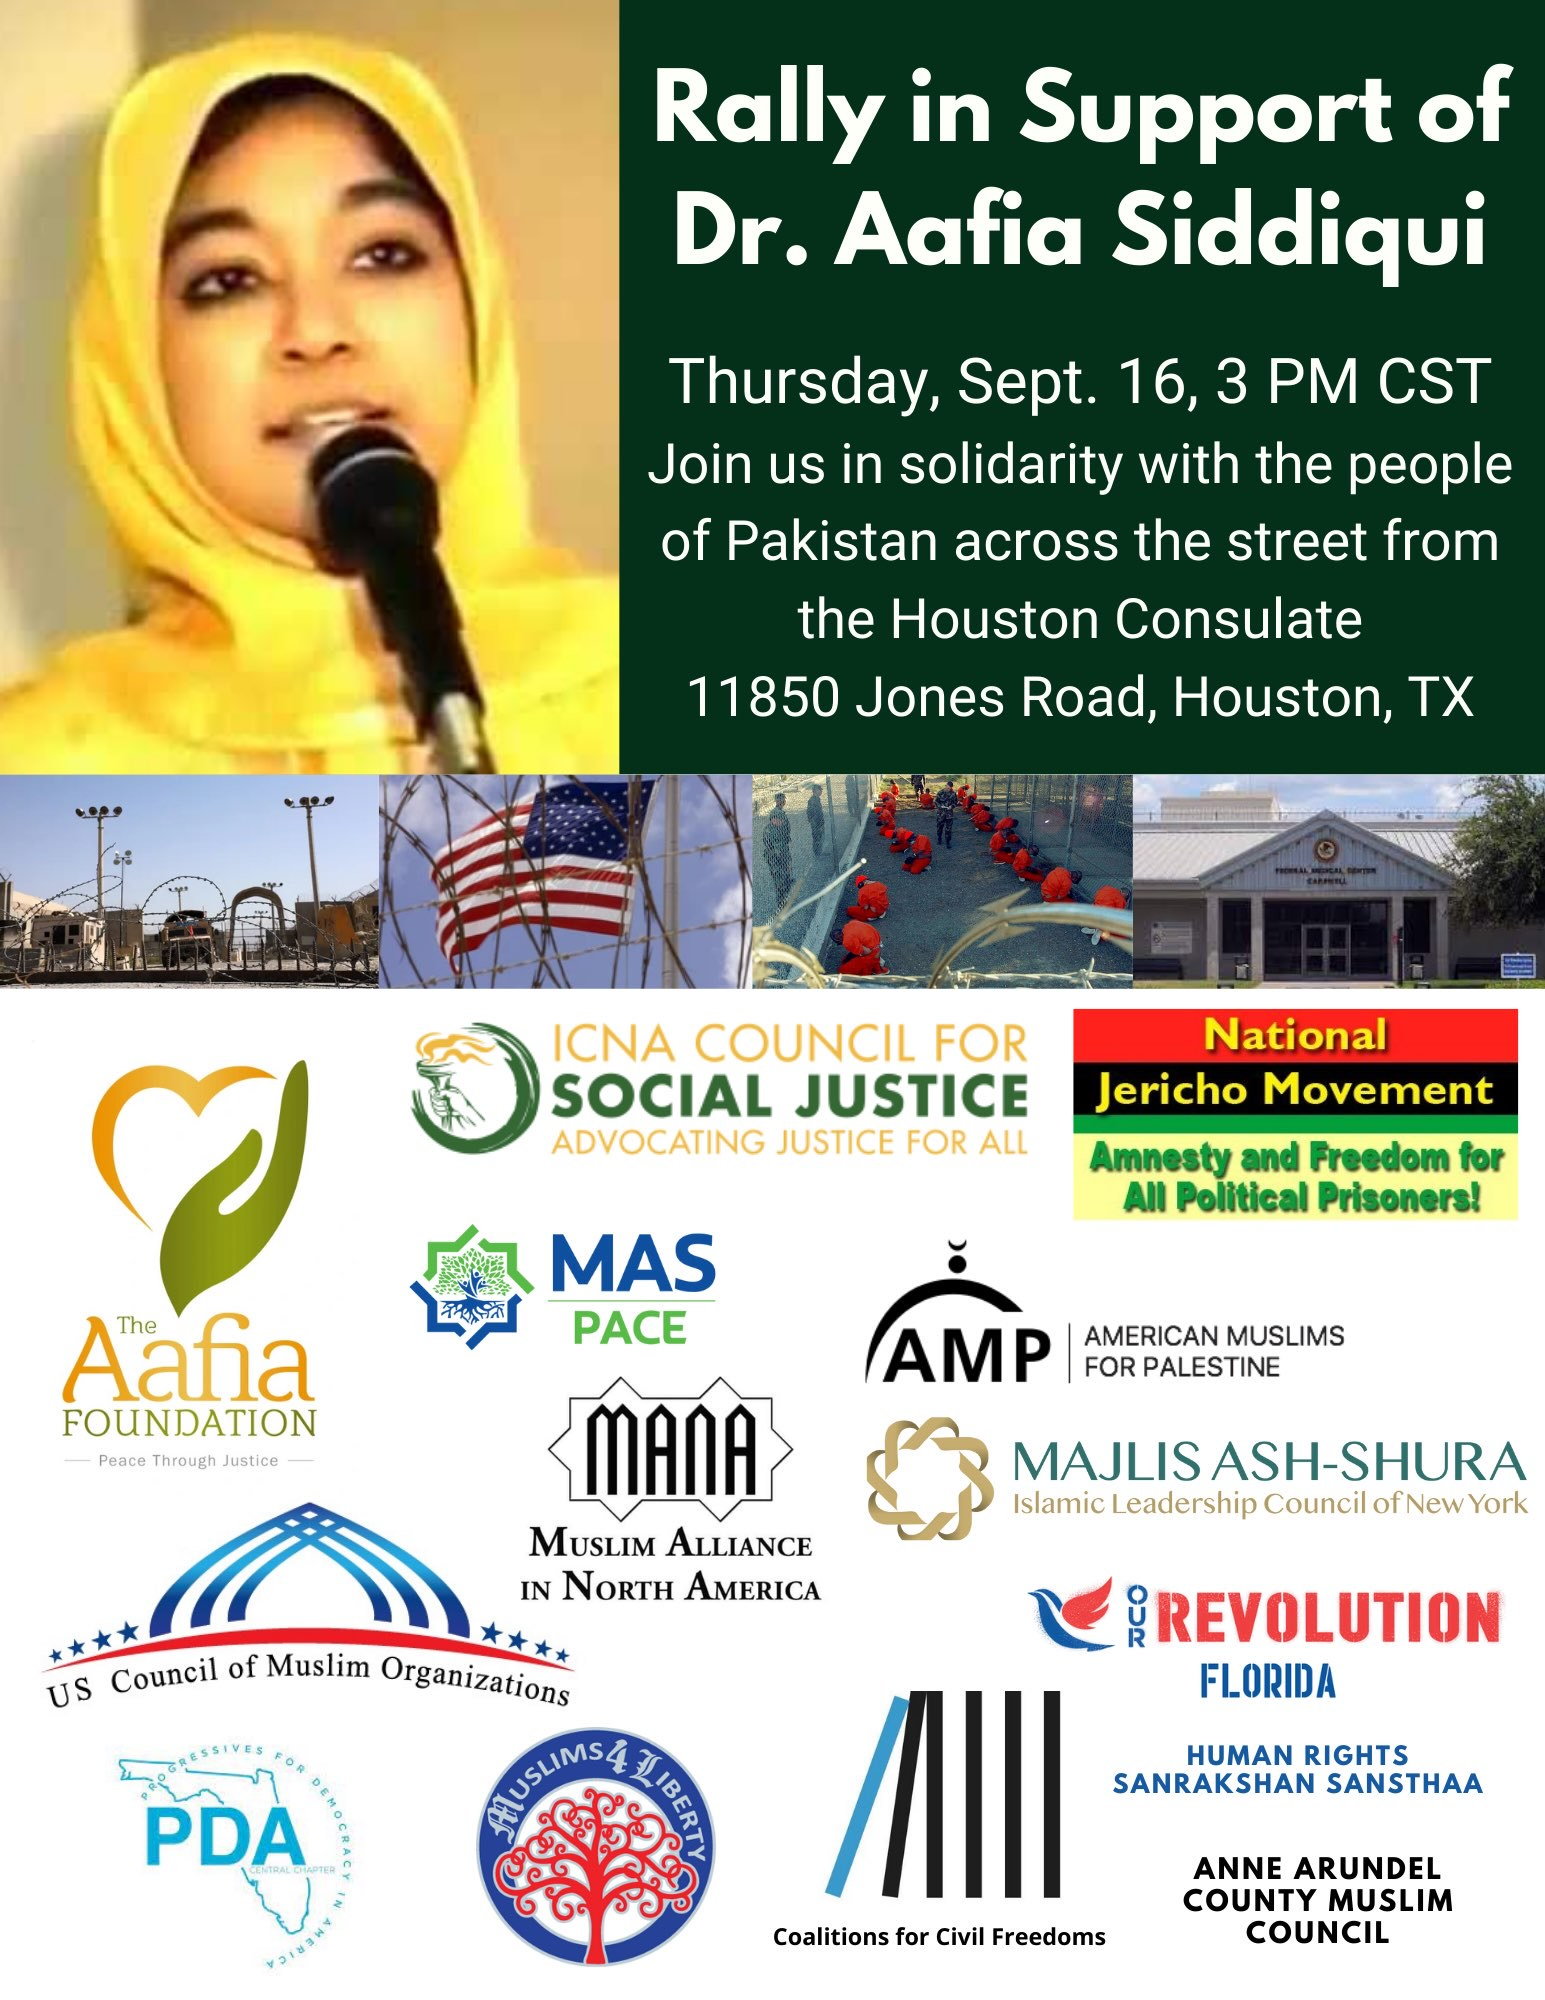 [Sep 16, 2021; Pakistan Consulate; Houston, TX] Free Aafia Mobilization